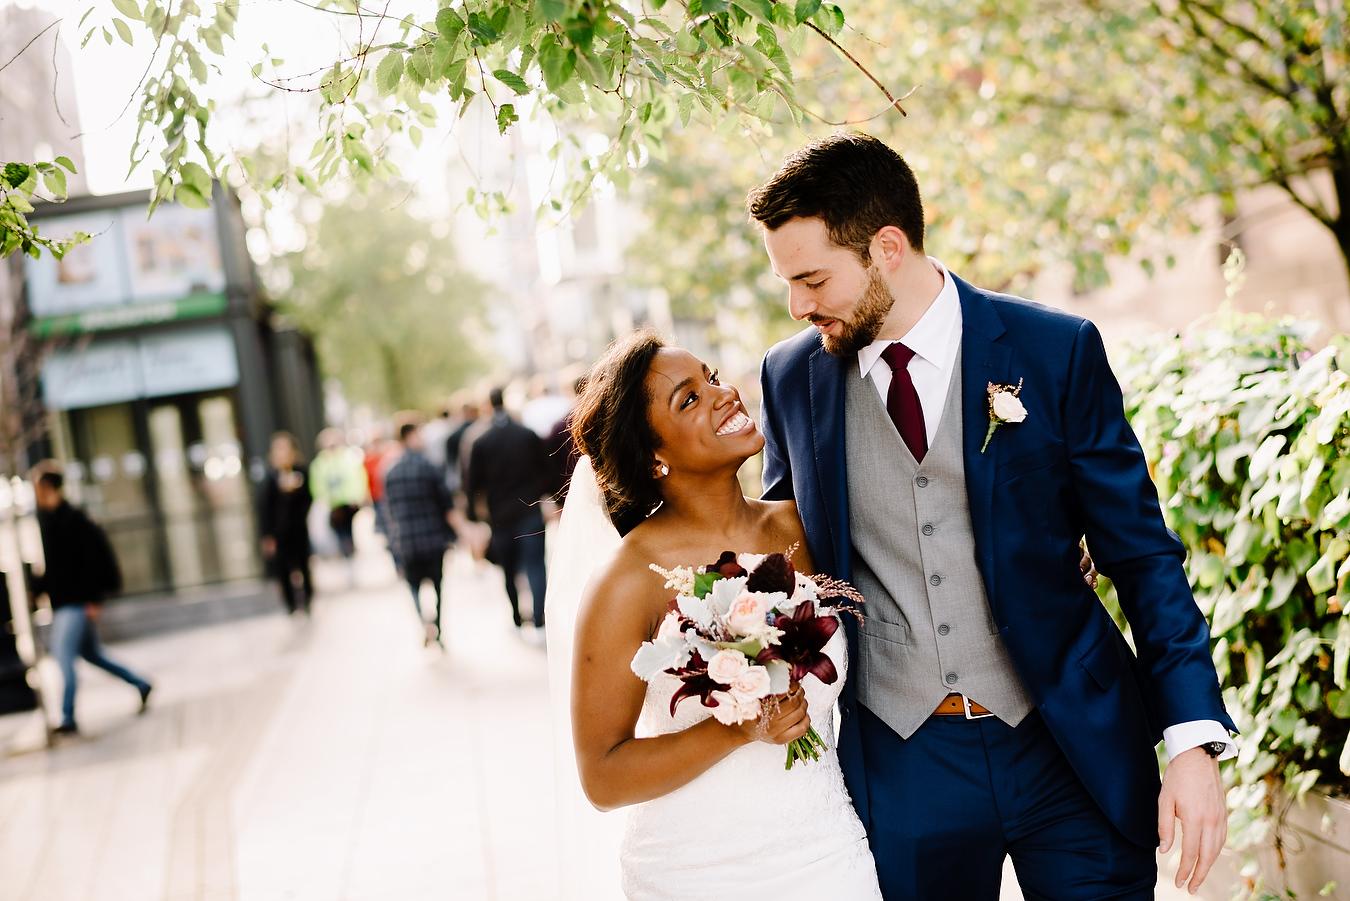 lifestyle boston weddings and photography